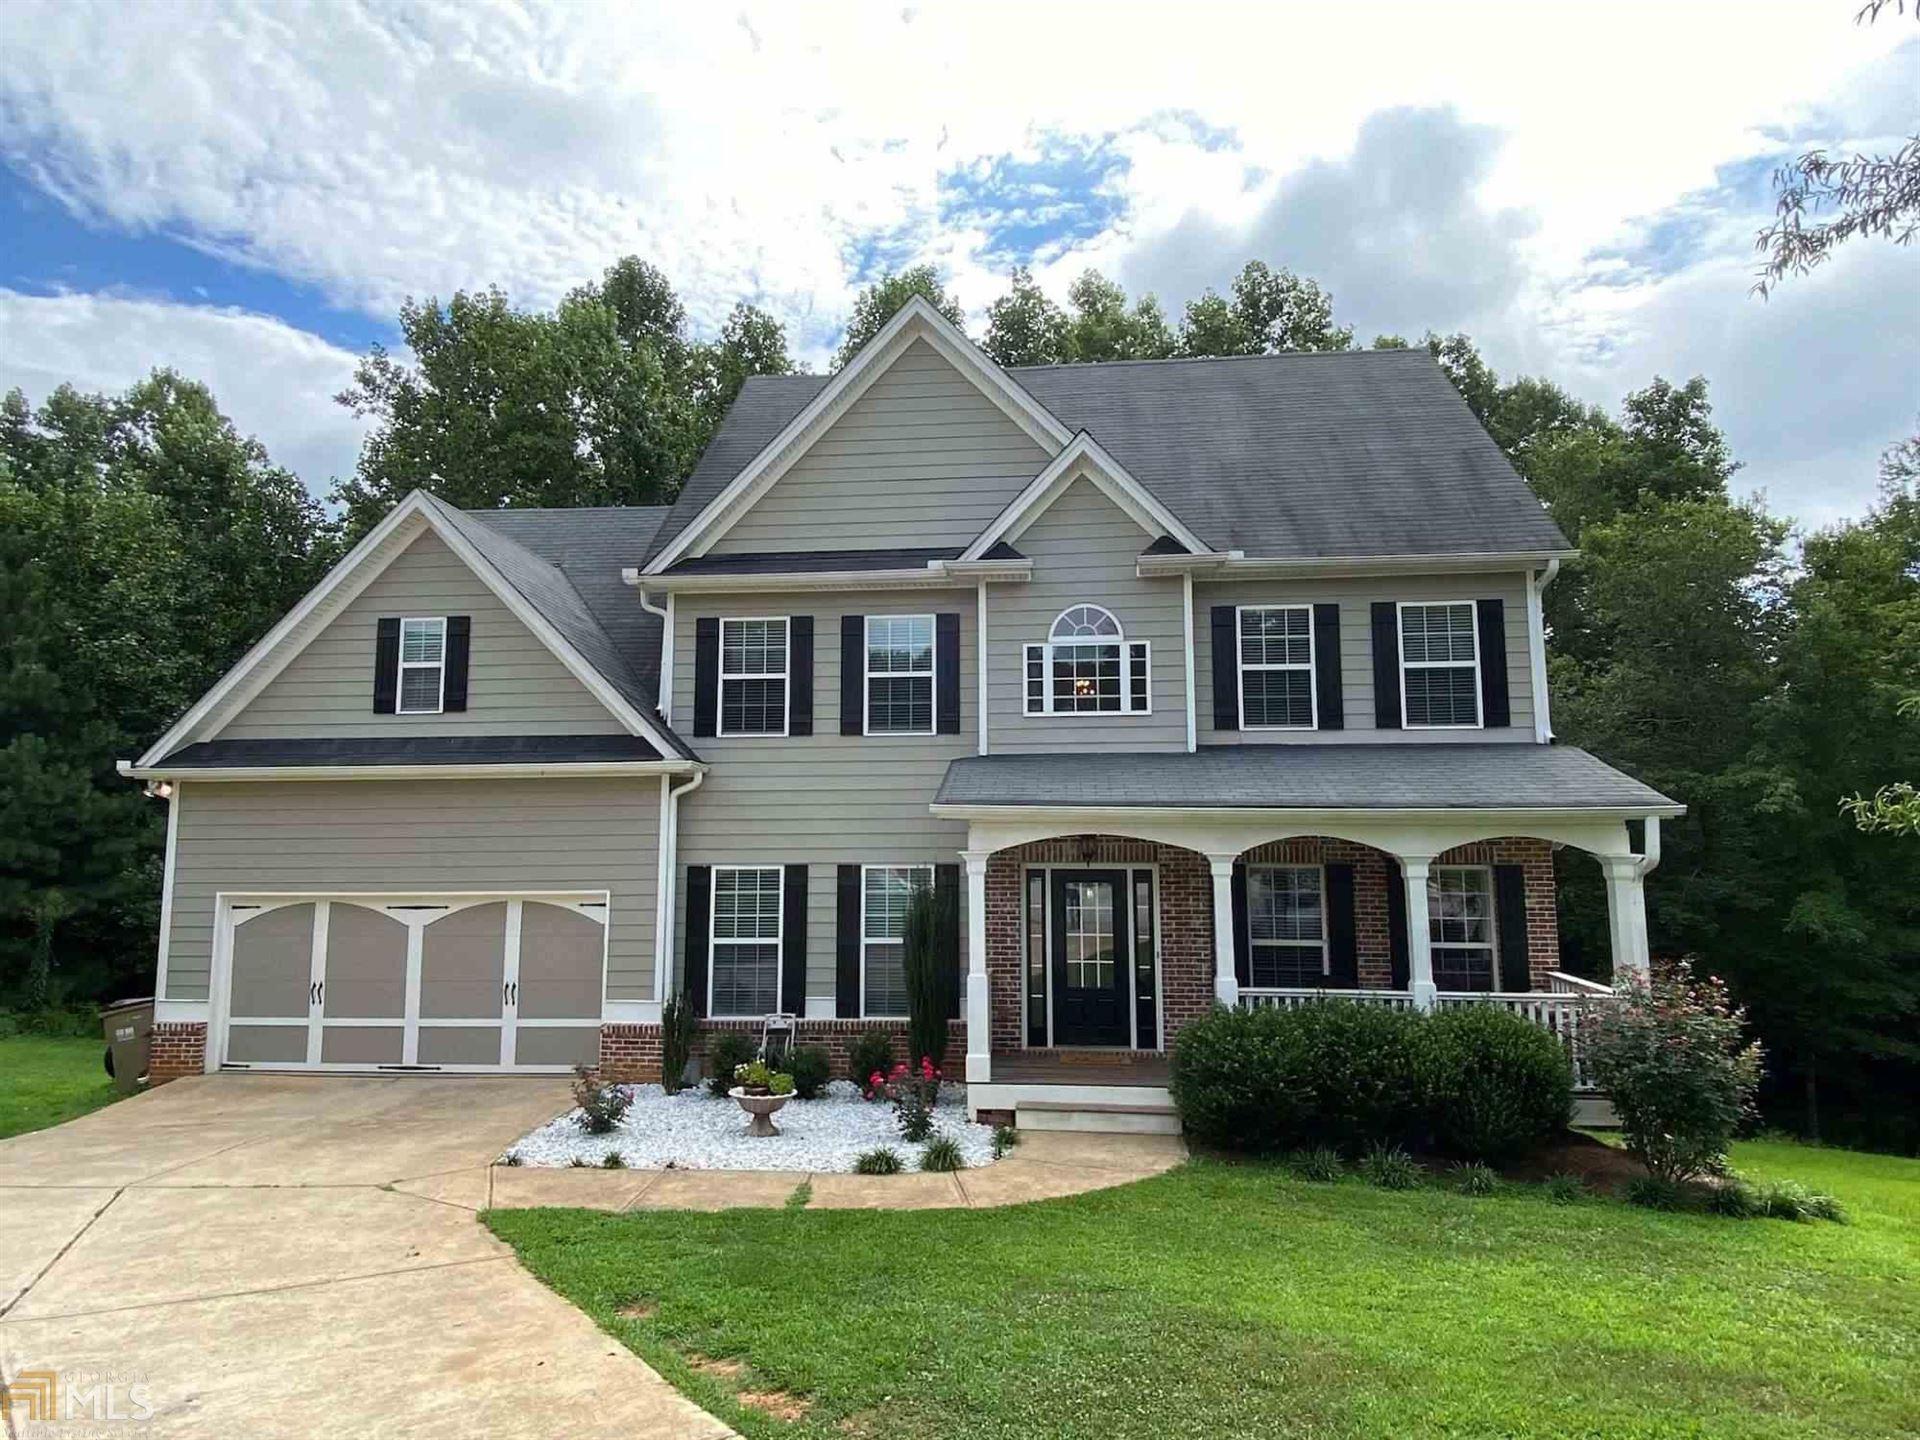 3965 Walnut Grove Way, Gainesville, GA 30506 - #: 8830336